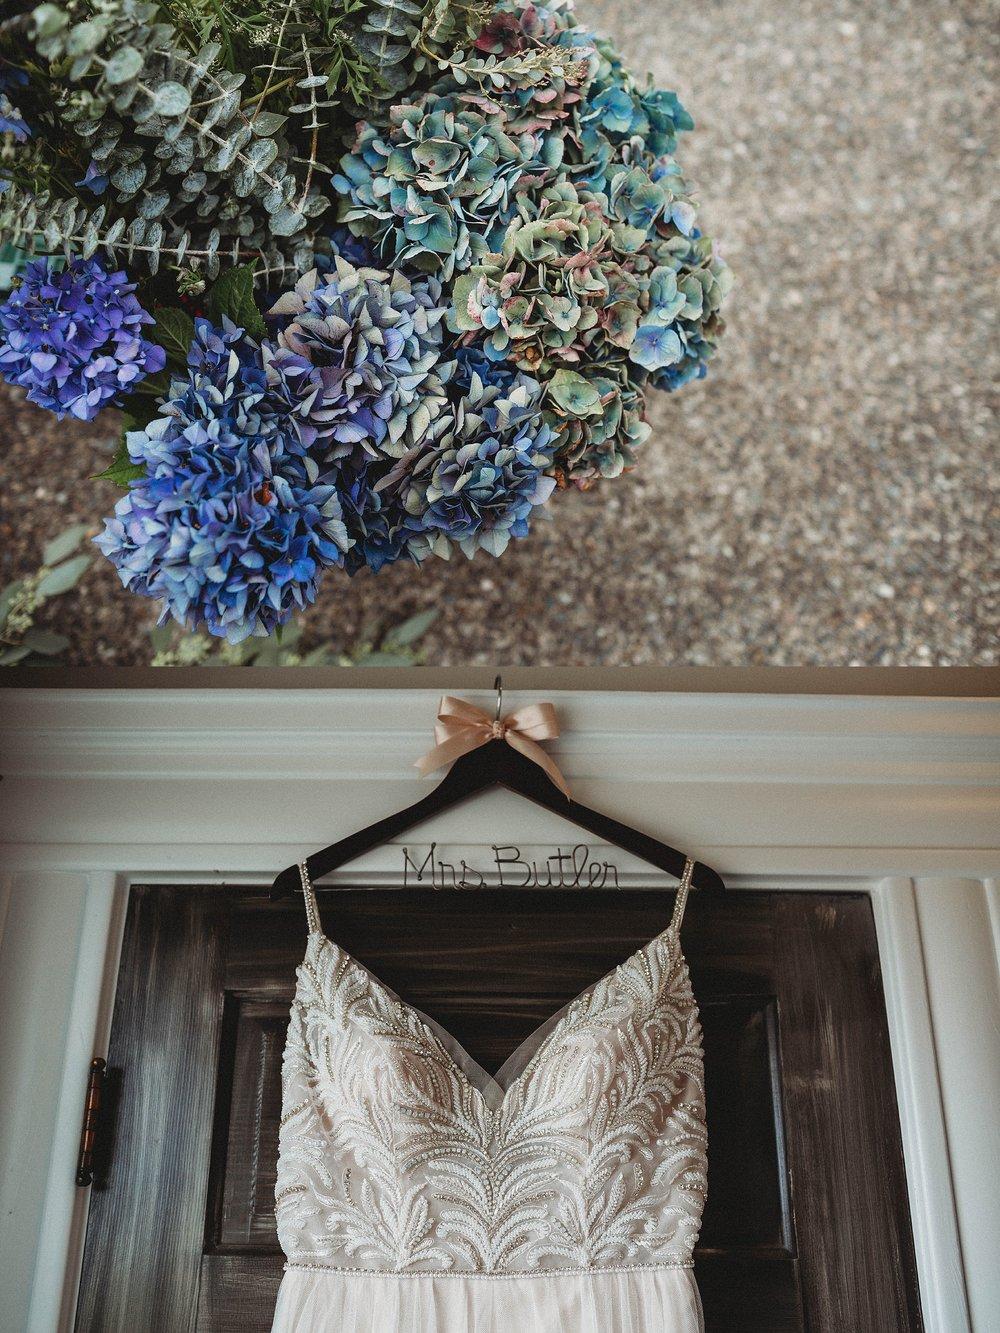 olson mansion wedding photography - jill and garrett - ashley vos photography - seattle area wedding photographer-10.jpg